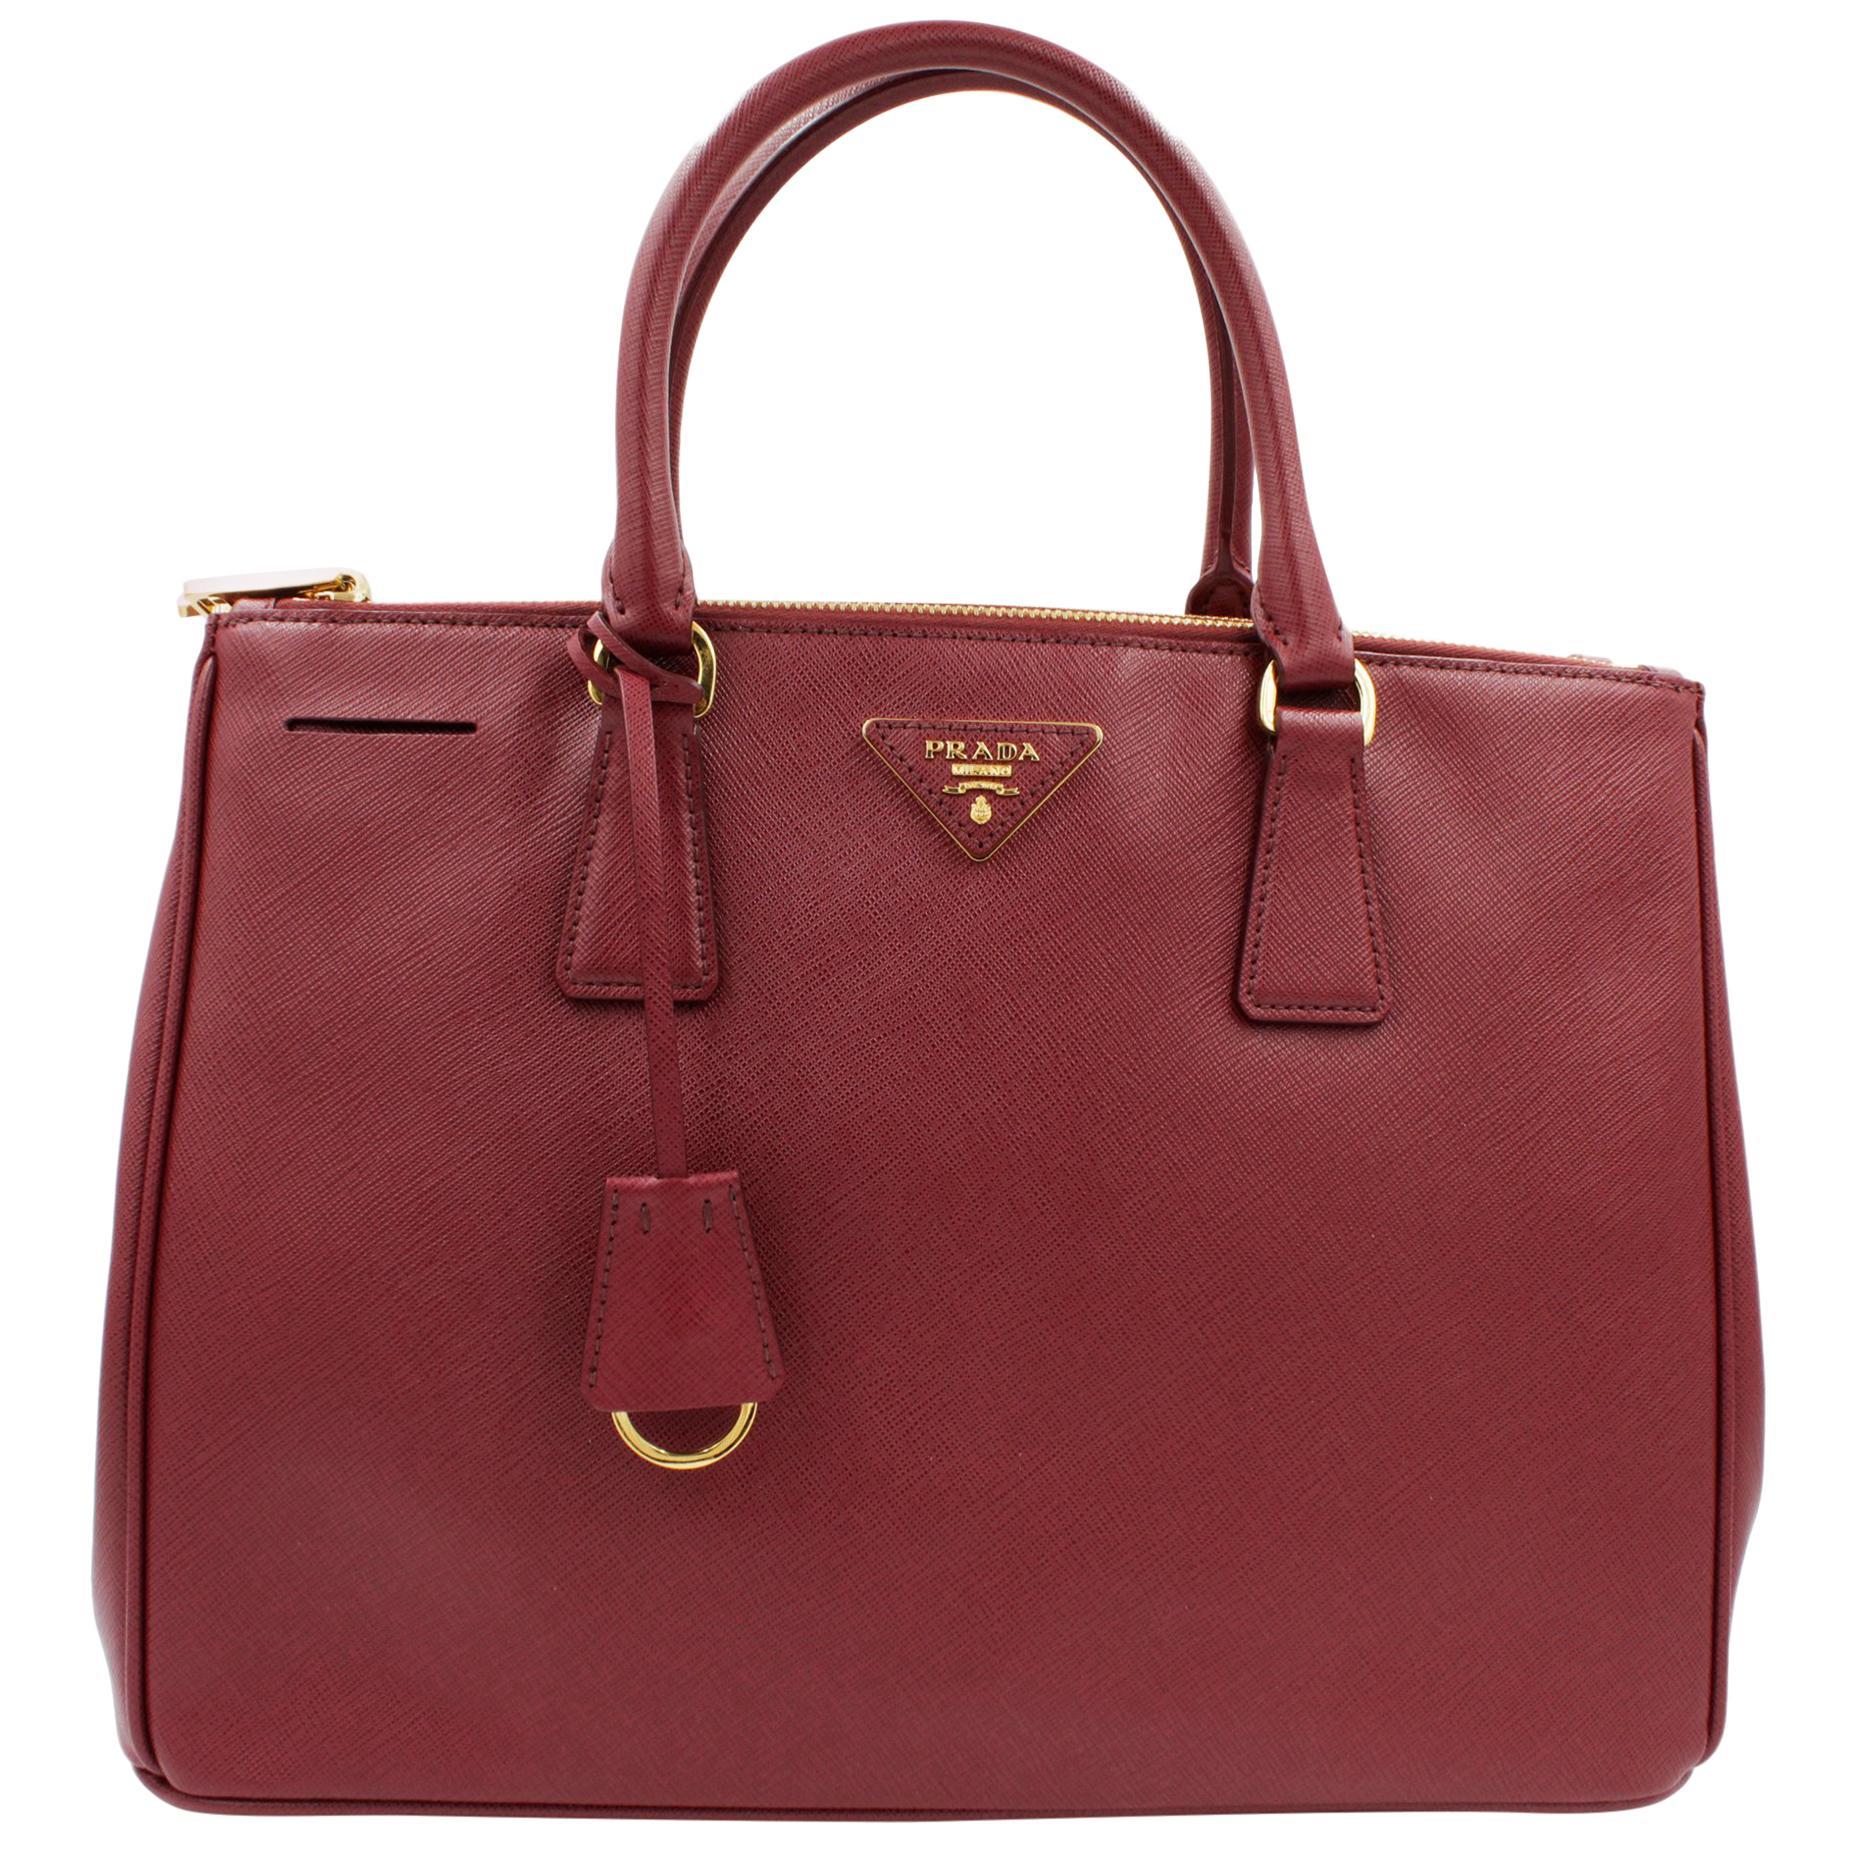 8748e02bf6f97c Prada Leather Bags - 908 For Sale on 1stdibs